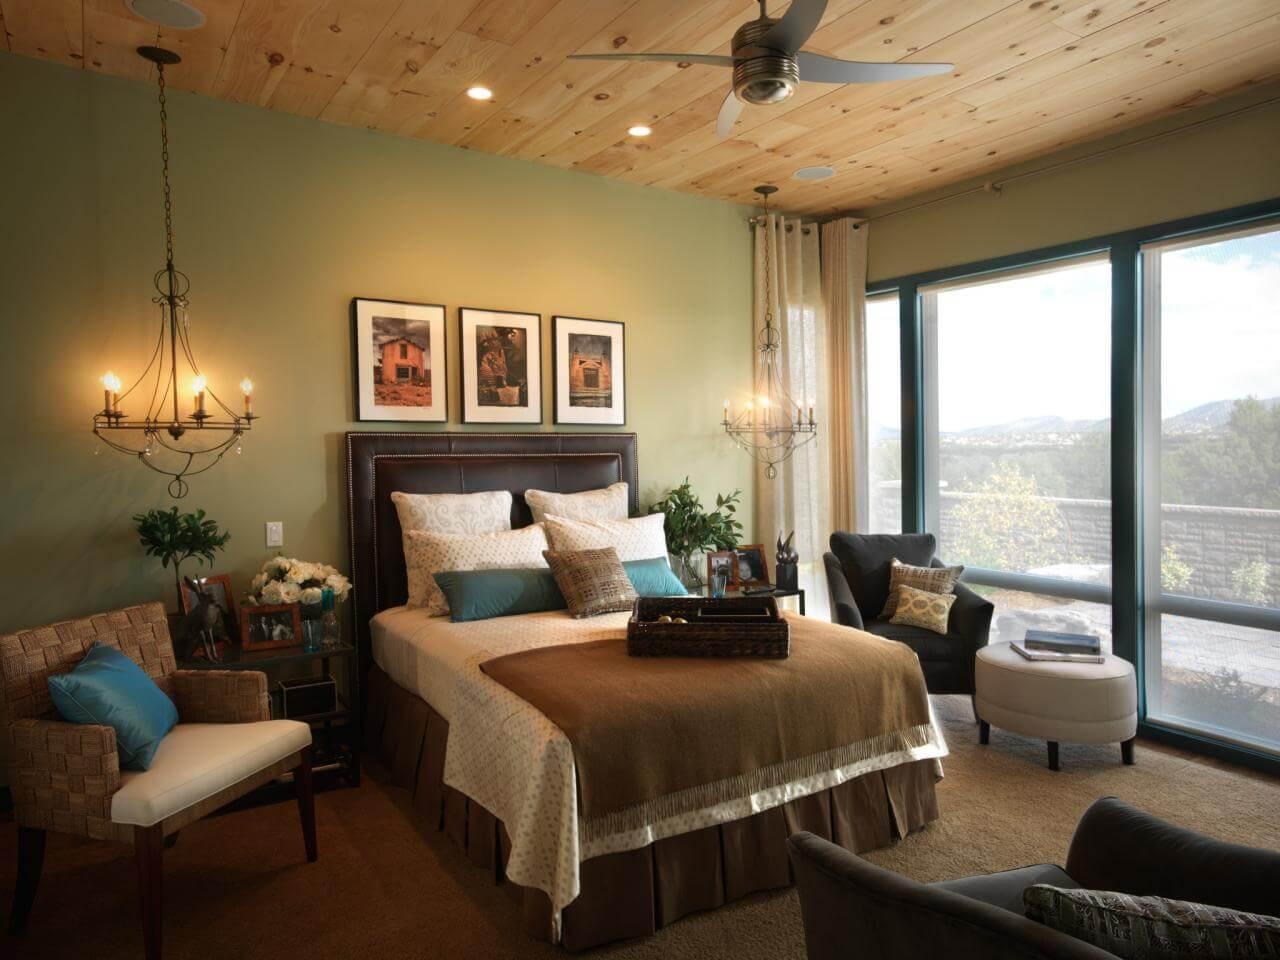 Master Bedrooms Green Walls